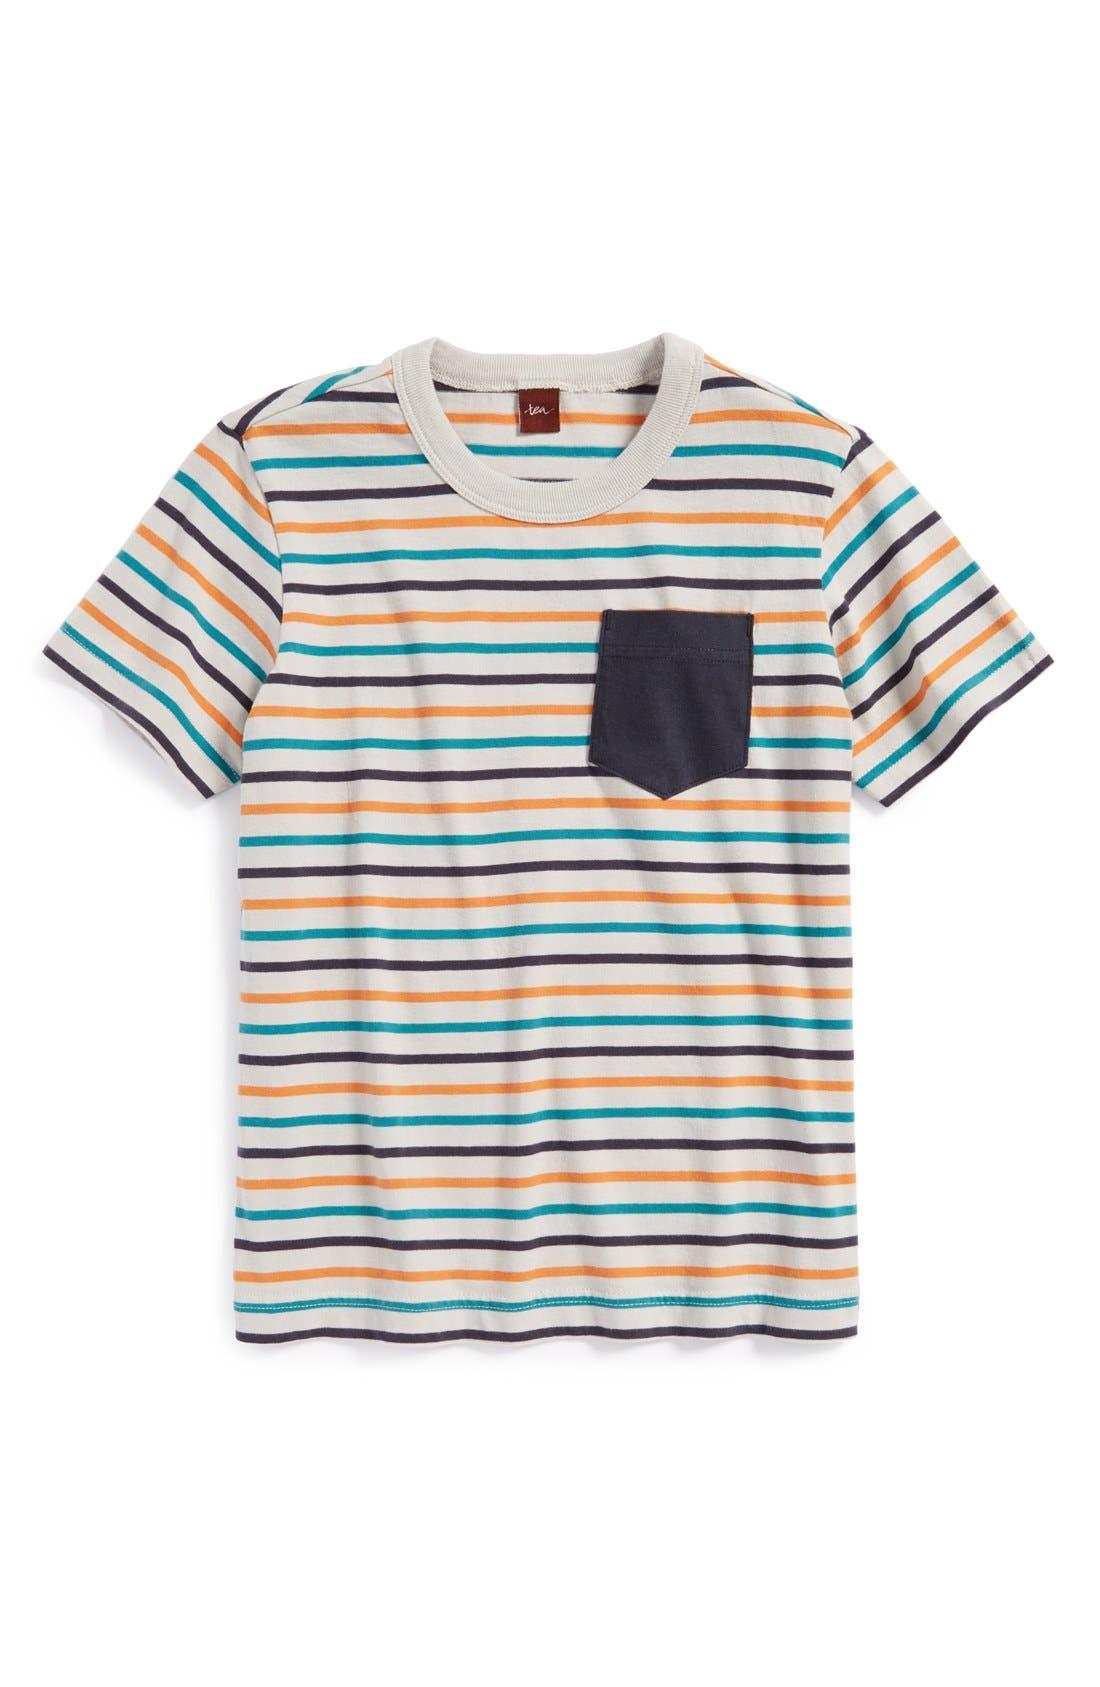 Main Image - Tea Collection 'Elbe' Stripe Cotton T-Shirt (Toddler Boys & Little Boys)